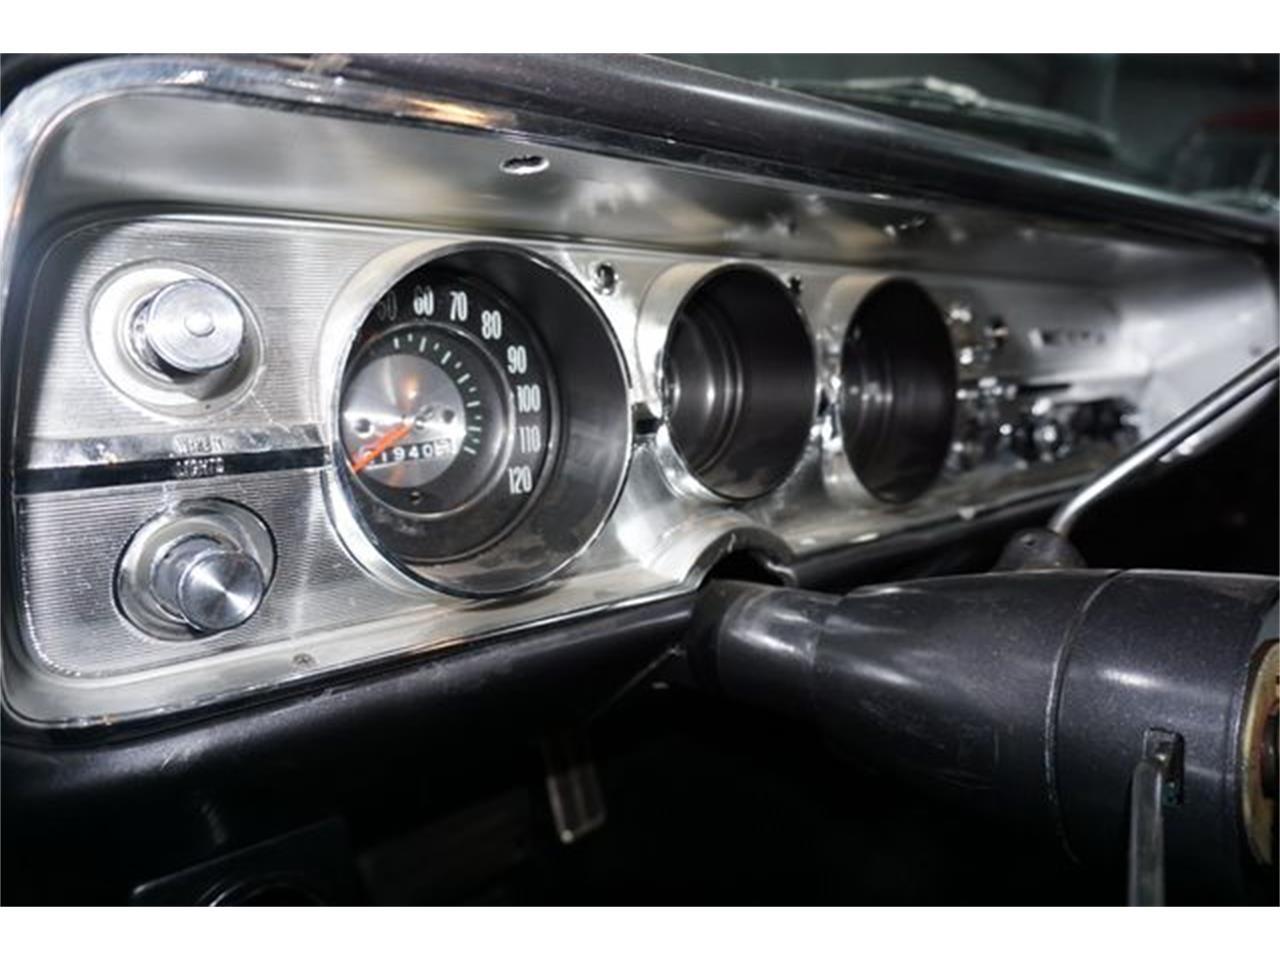 1965 Chevrolet El Camino (CC-1172474) for sale in Blanchard, Oklahoma